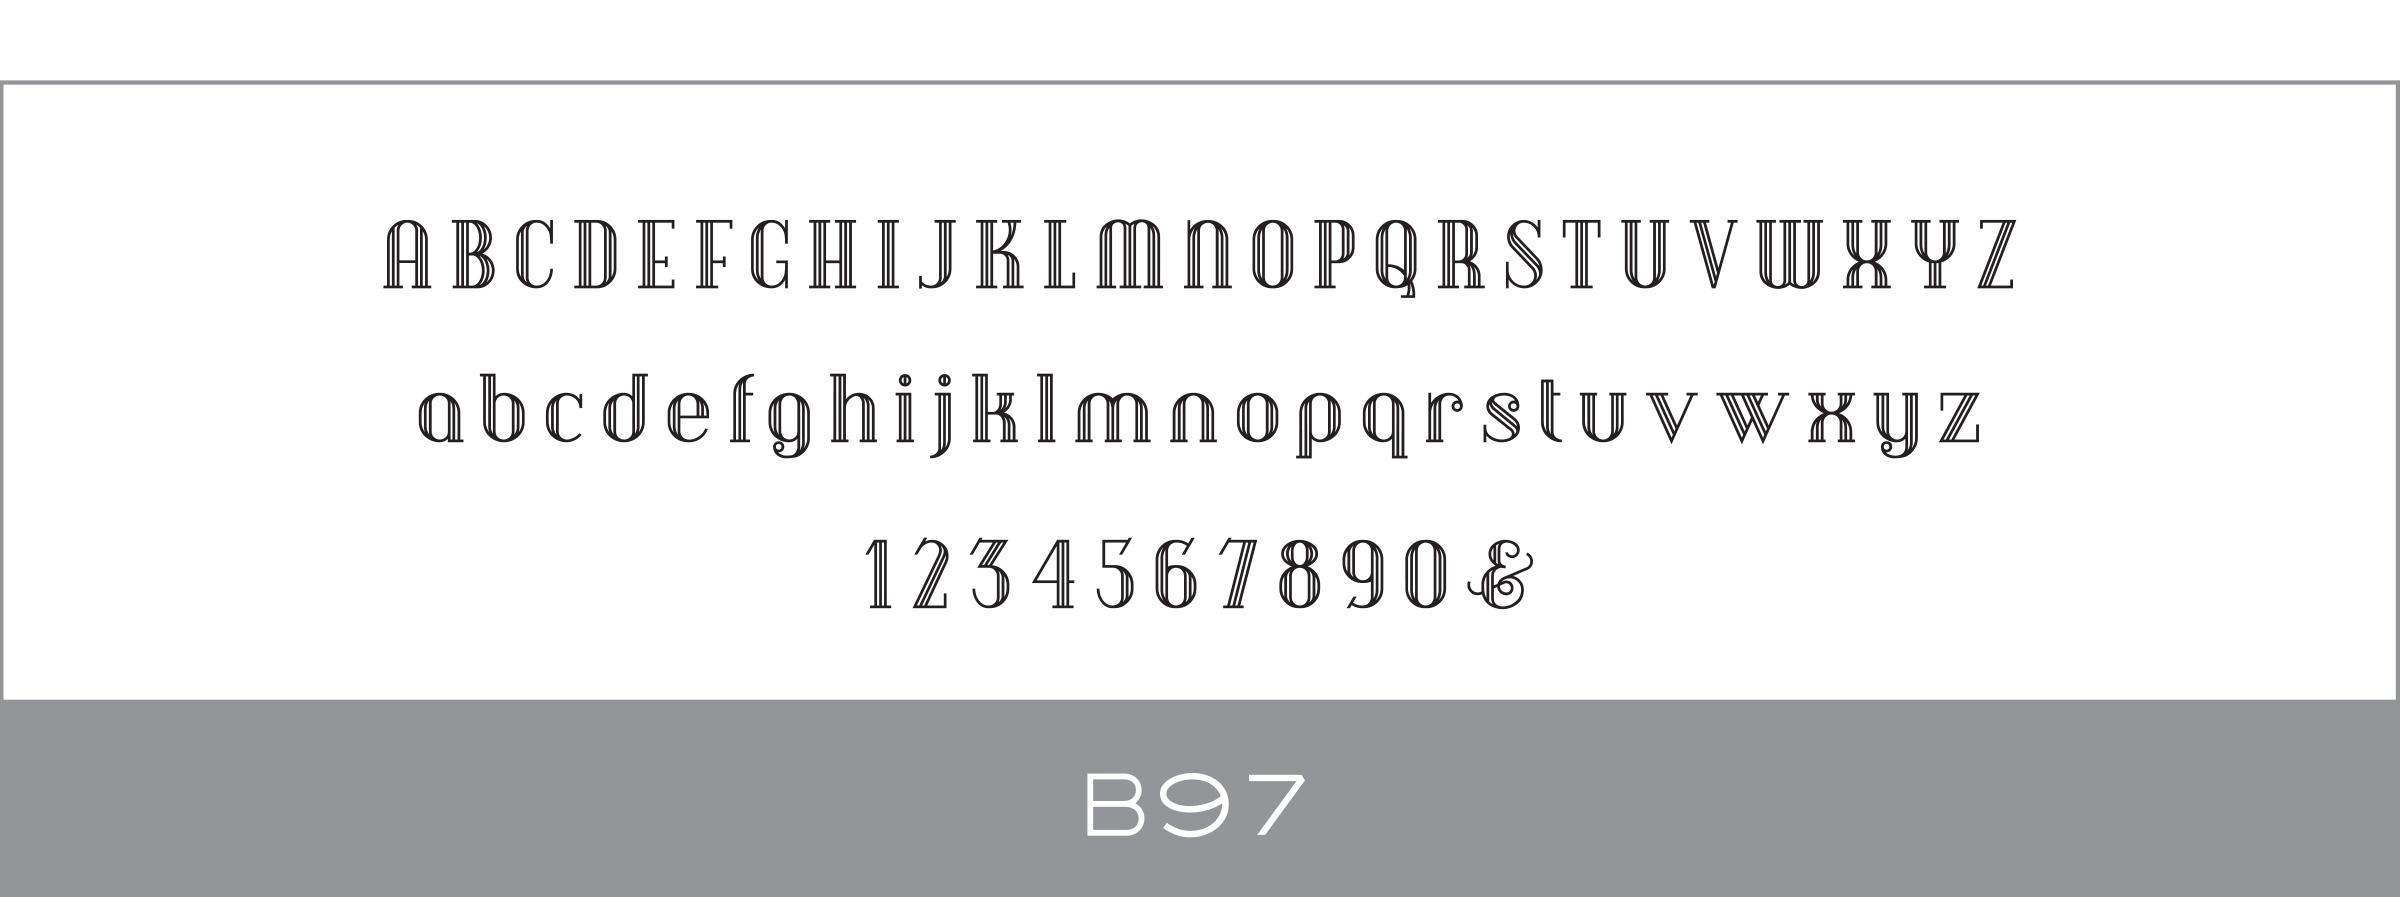 B97_Haute_Papier_Font.jpg